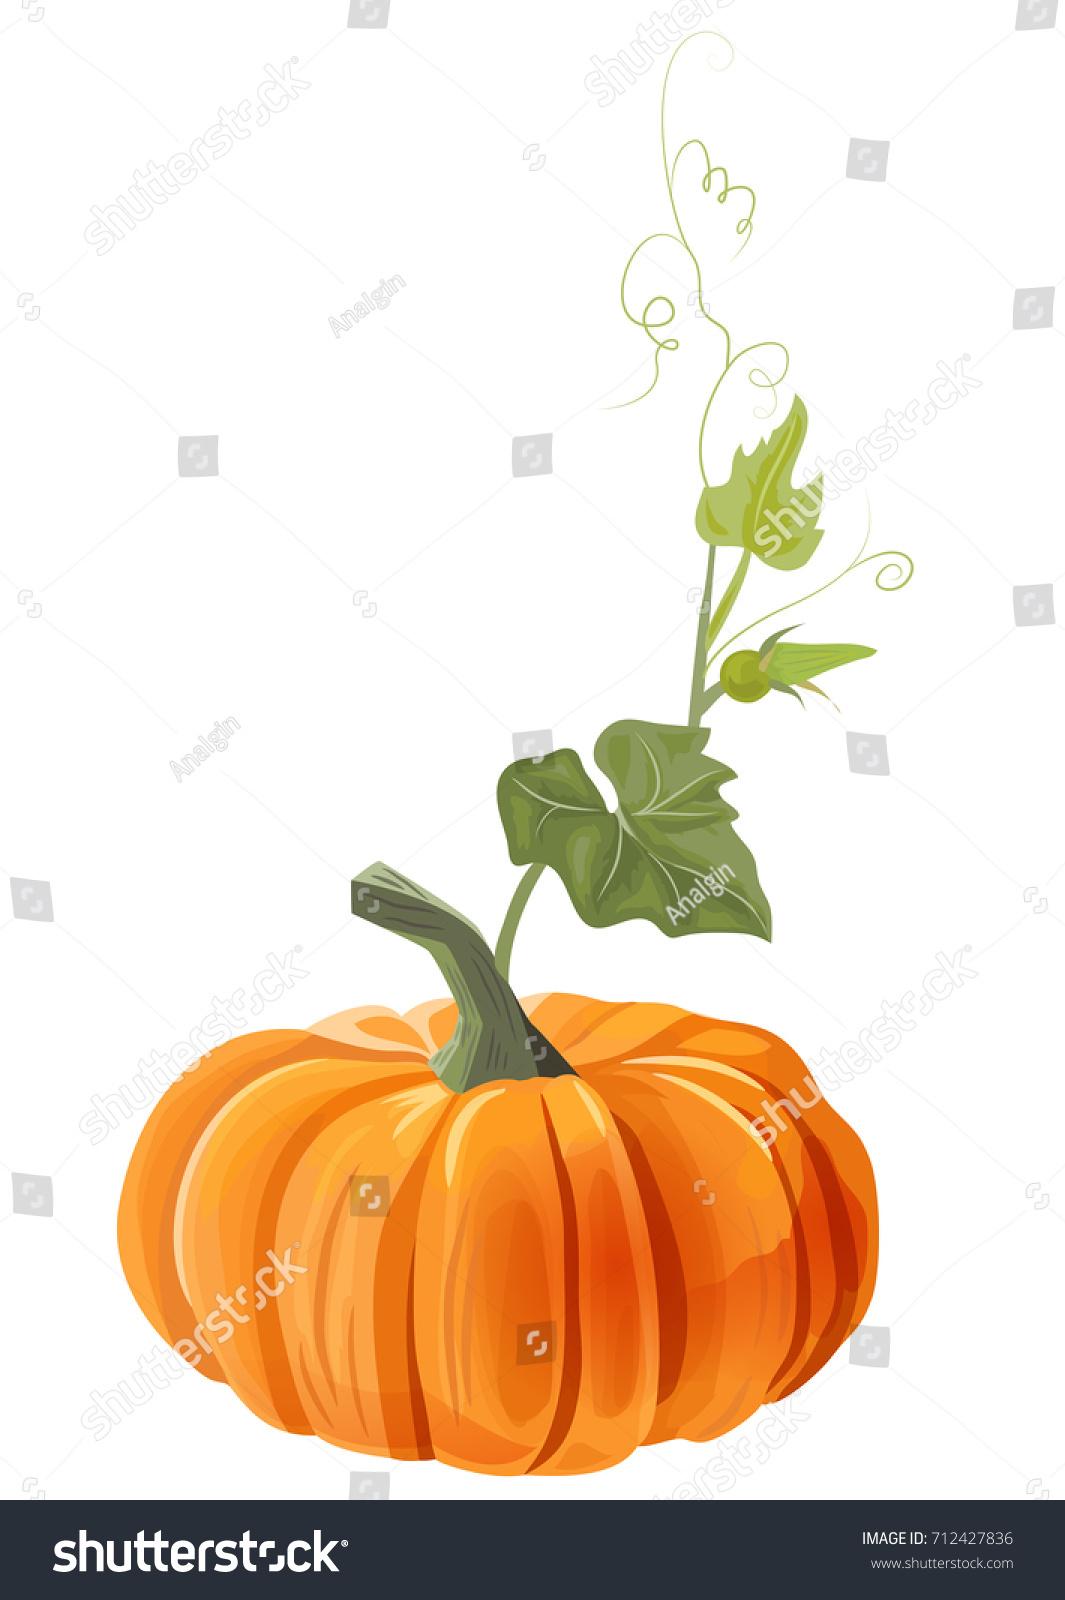 Orange Pumpkin Leaves Bud Stem Antennae Stock Vector Royalty Free 712427836